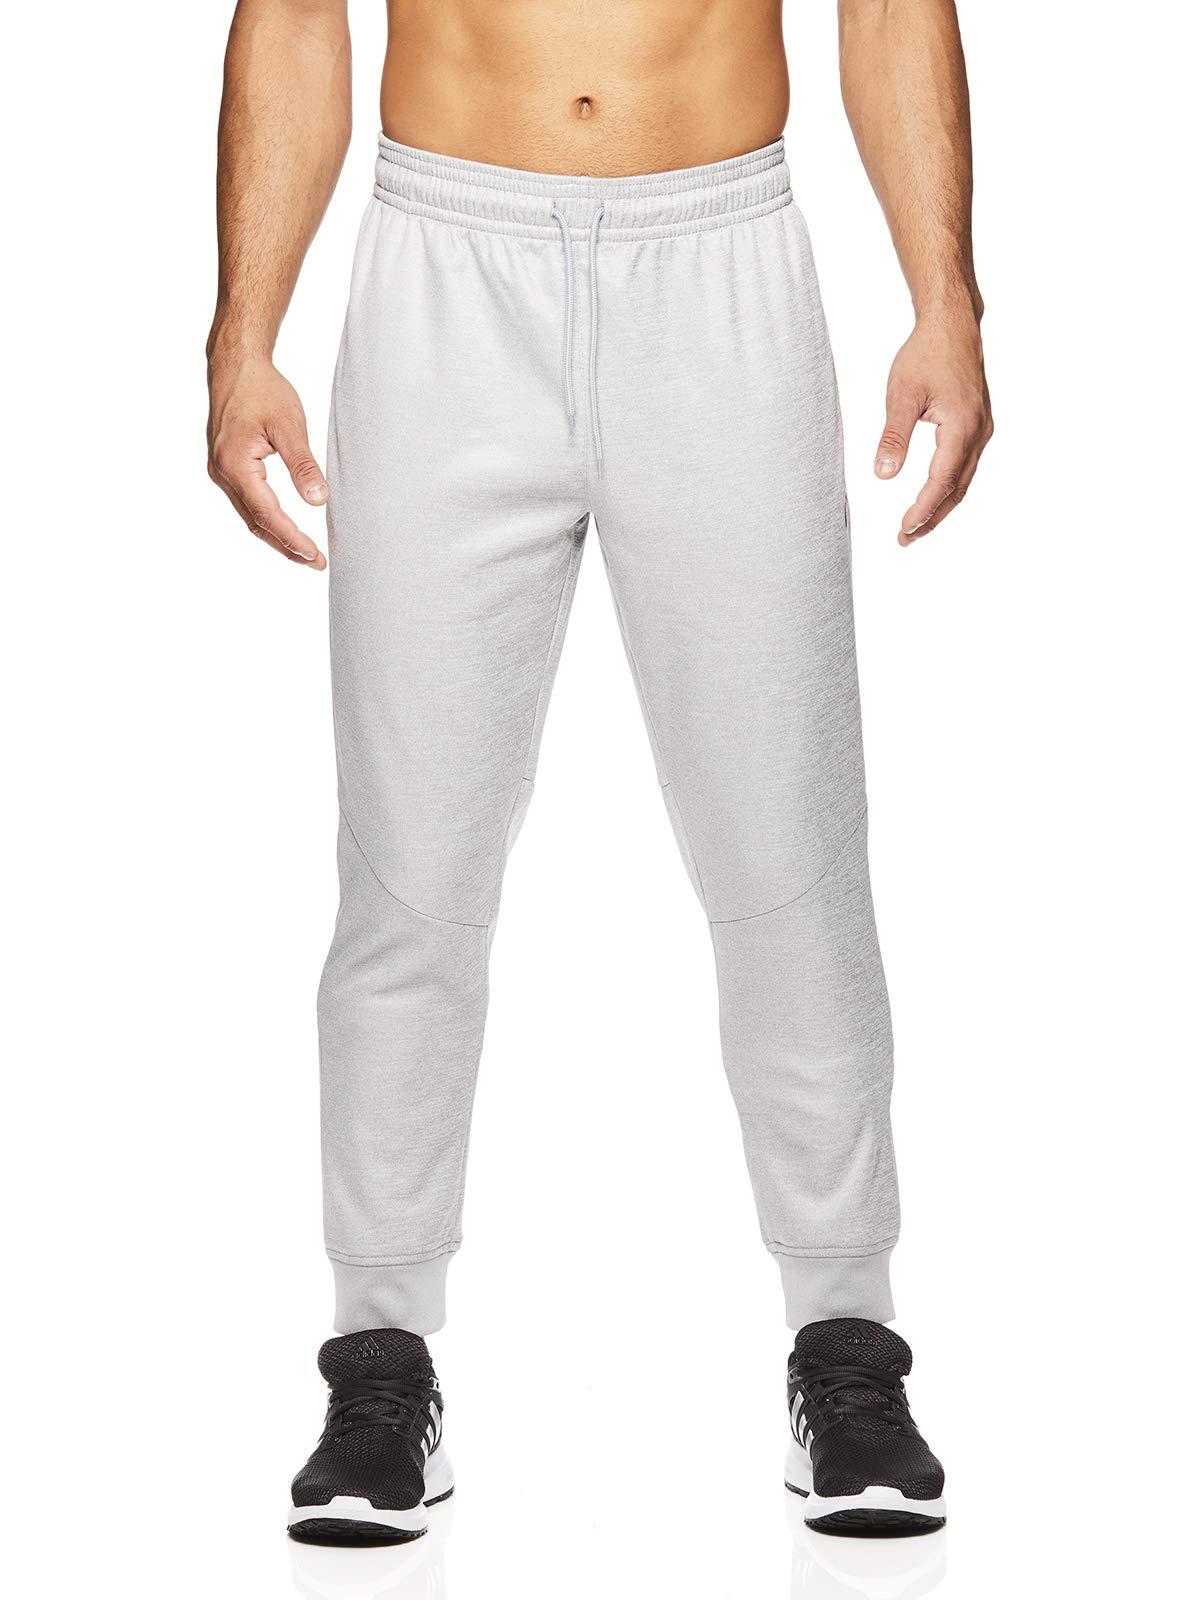 HEAD Men's Jogger Activewear Pants - Performance Workout & Running Sweatpants - Pro Sleet Heather, Small